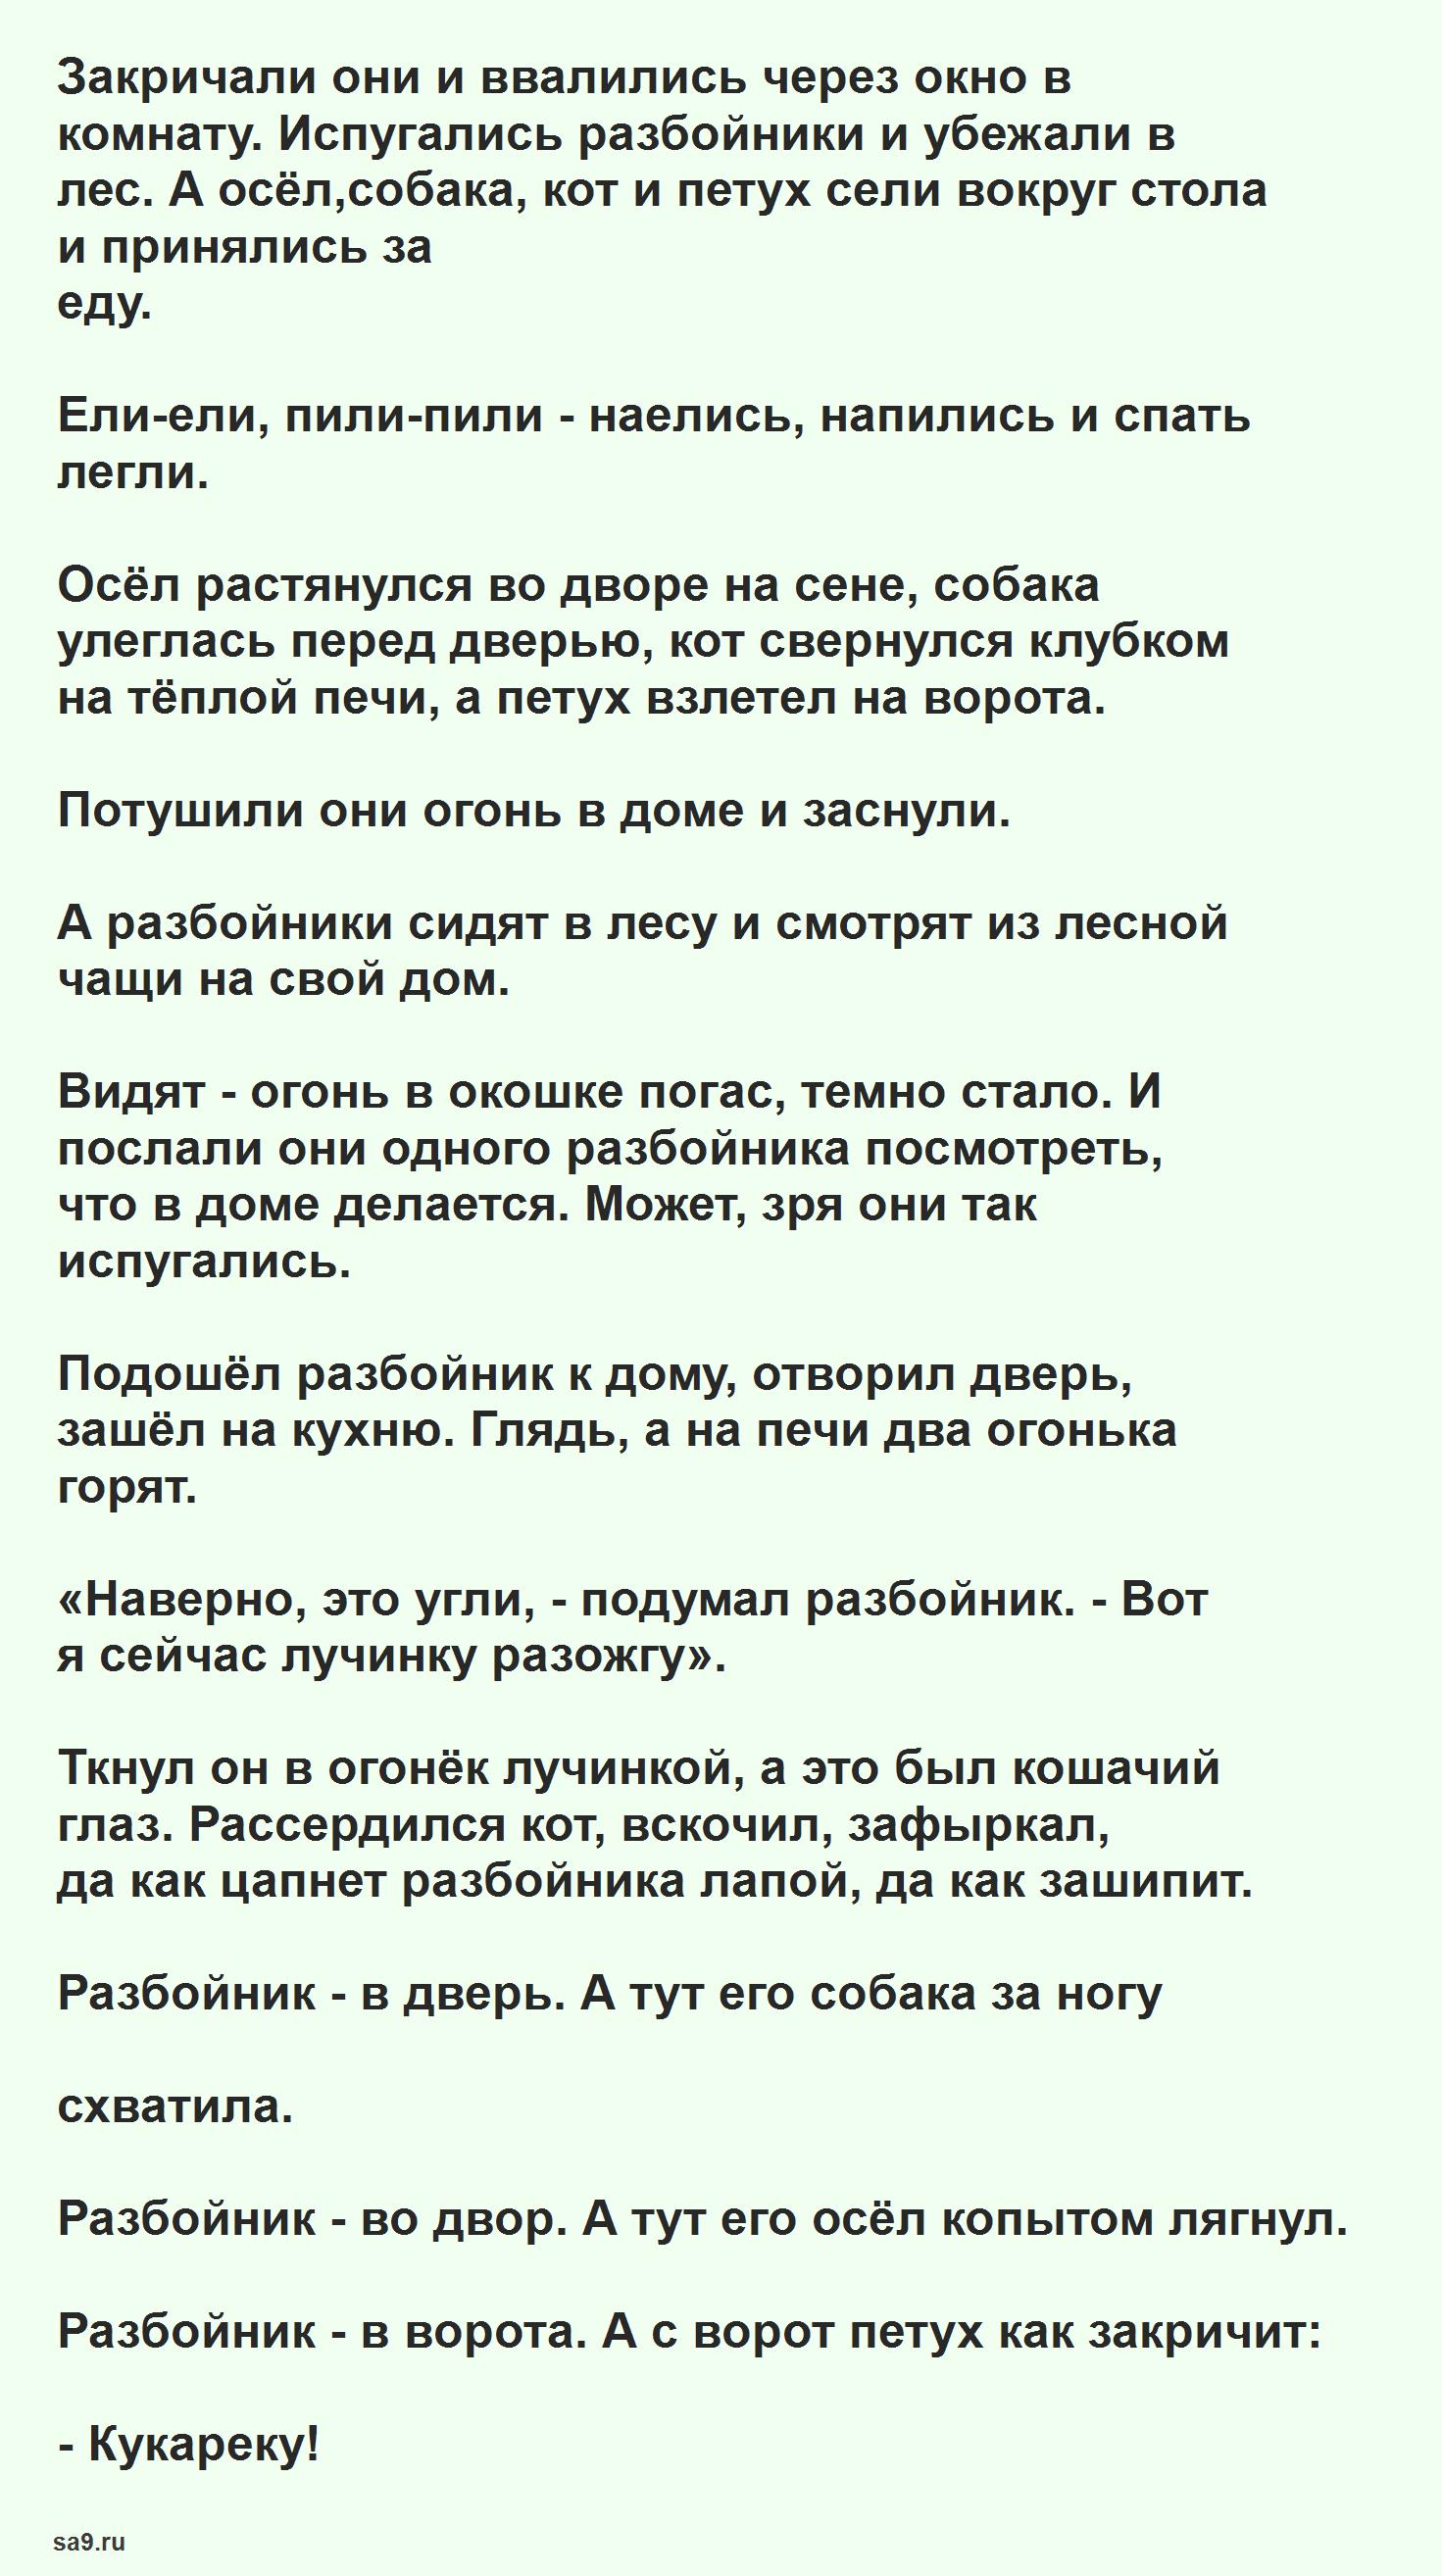 Бременские музыканты – сказка братьев Гримм, онлайн бесплатно